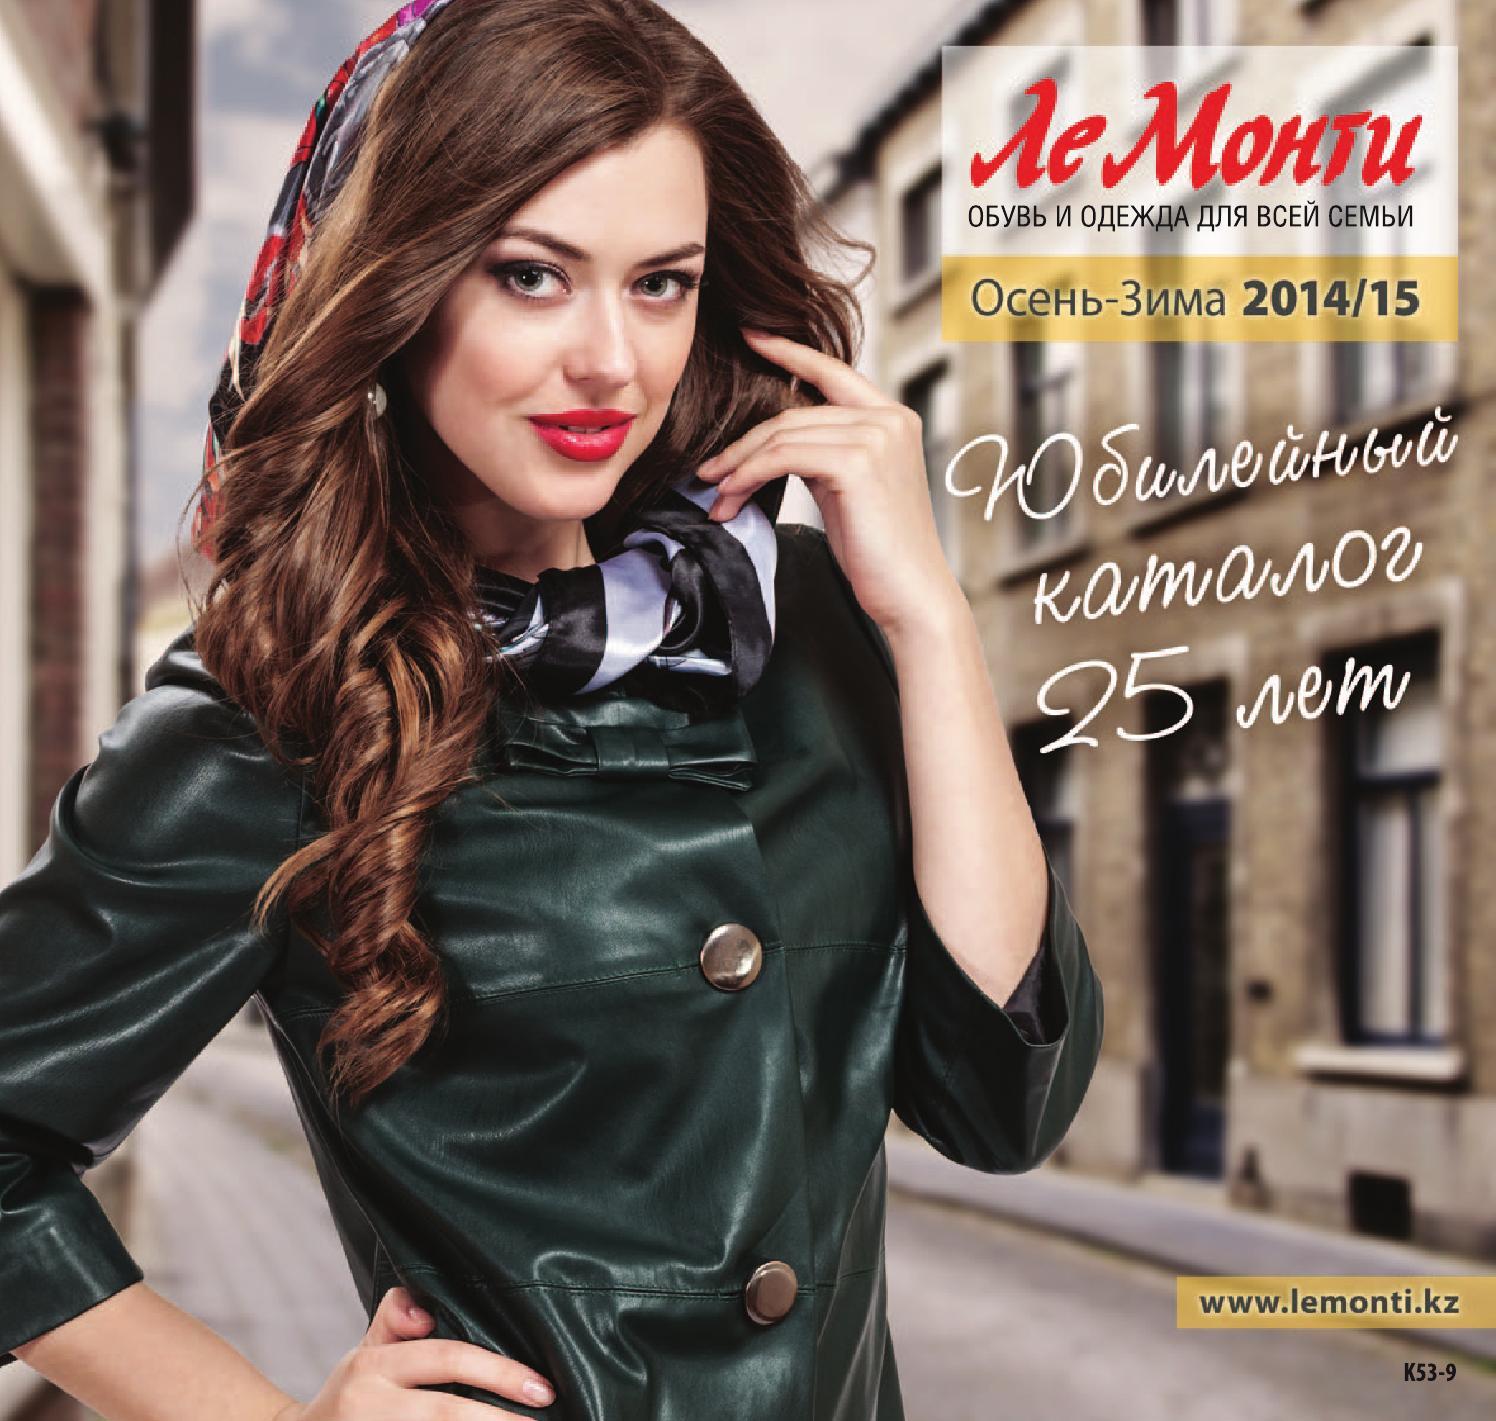 2818e2b5c335 Коллекция Ле Монти Осень-Зима 2014 15 Казахстан by Le Monti - issuu